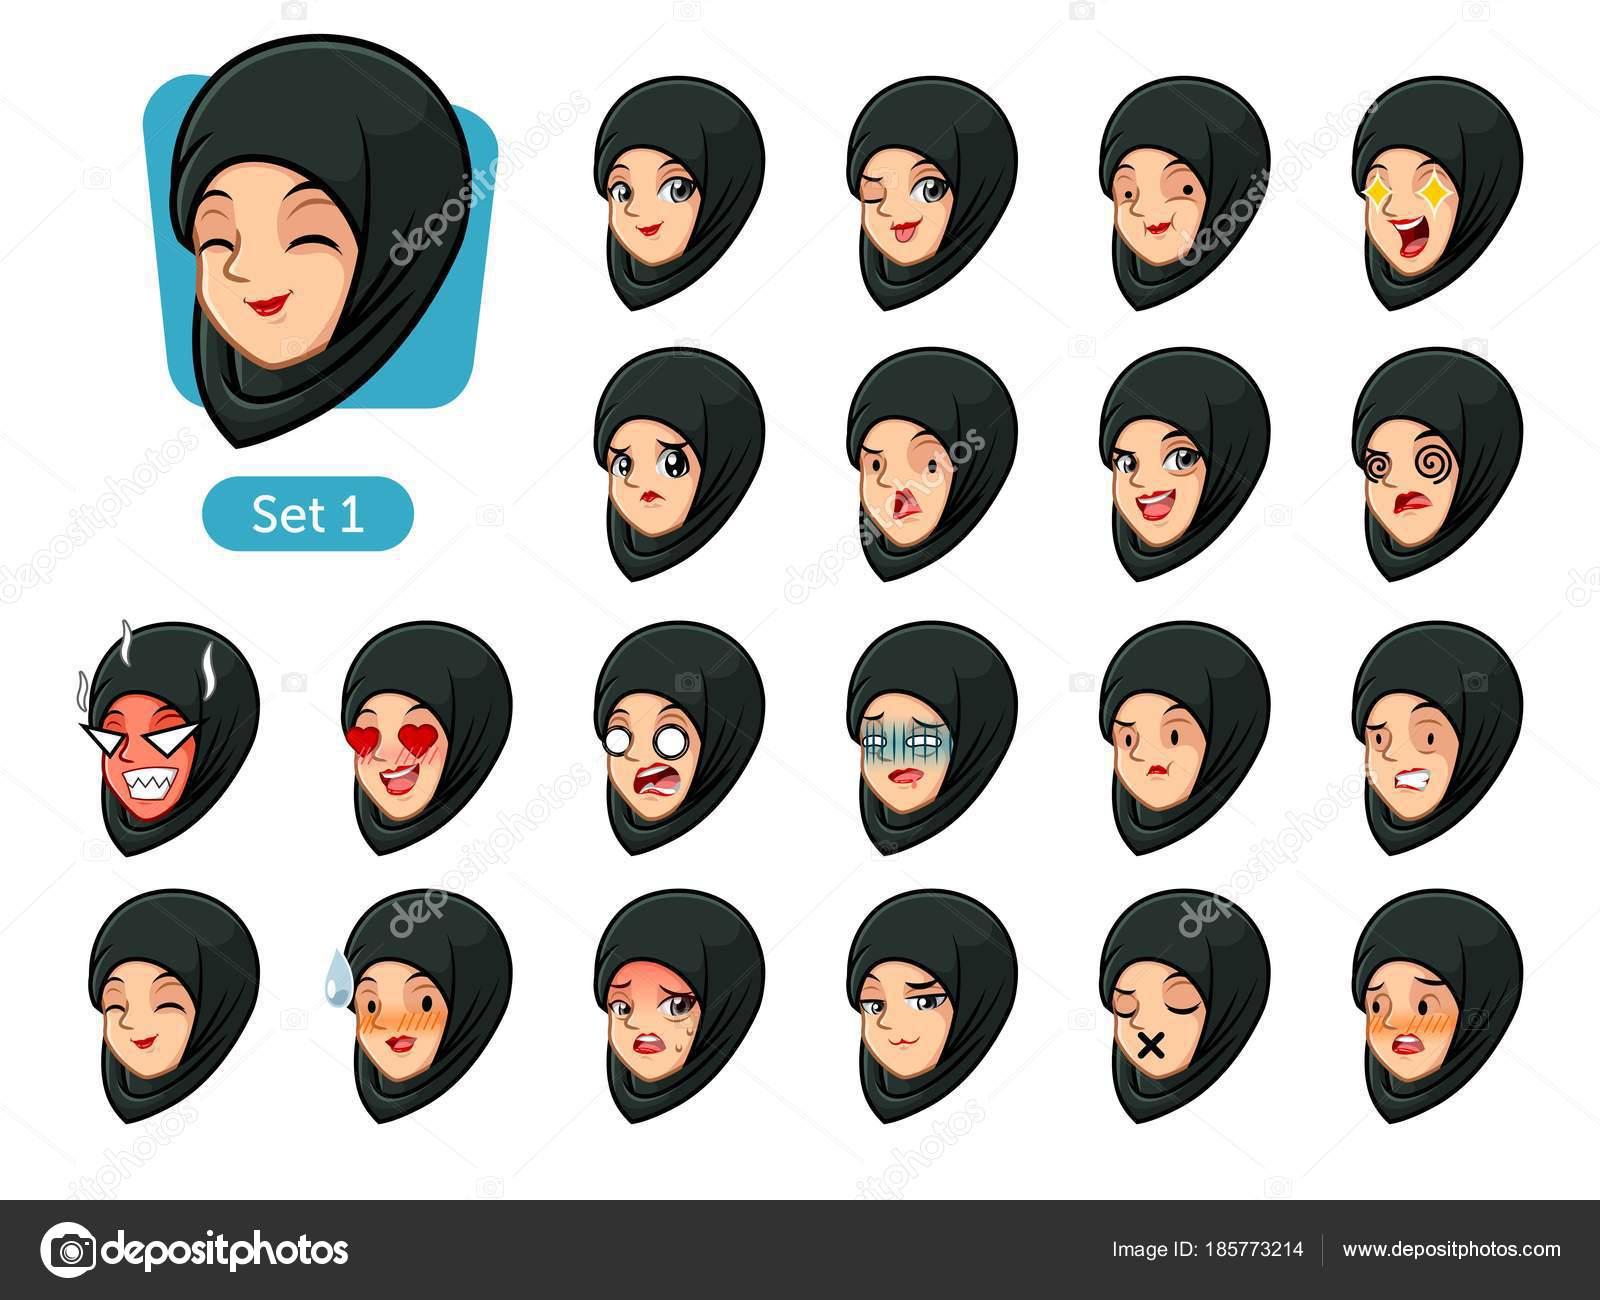 Premier Jeu Femme Musulmane Portant Hijab Noir Dessin Anime Avatars